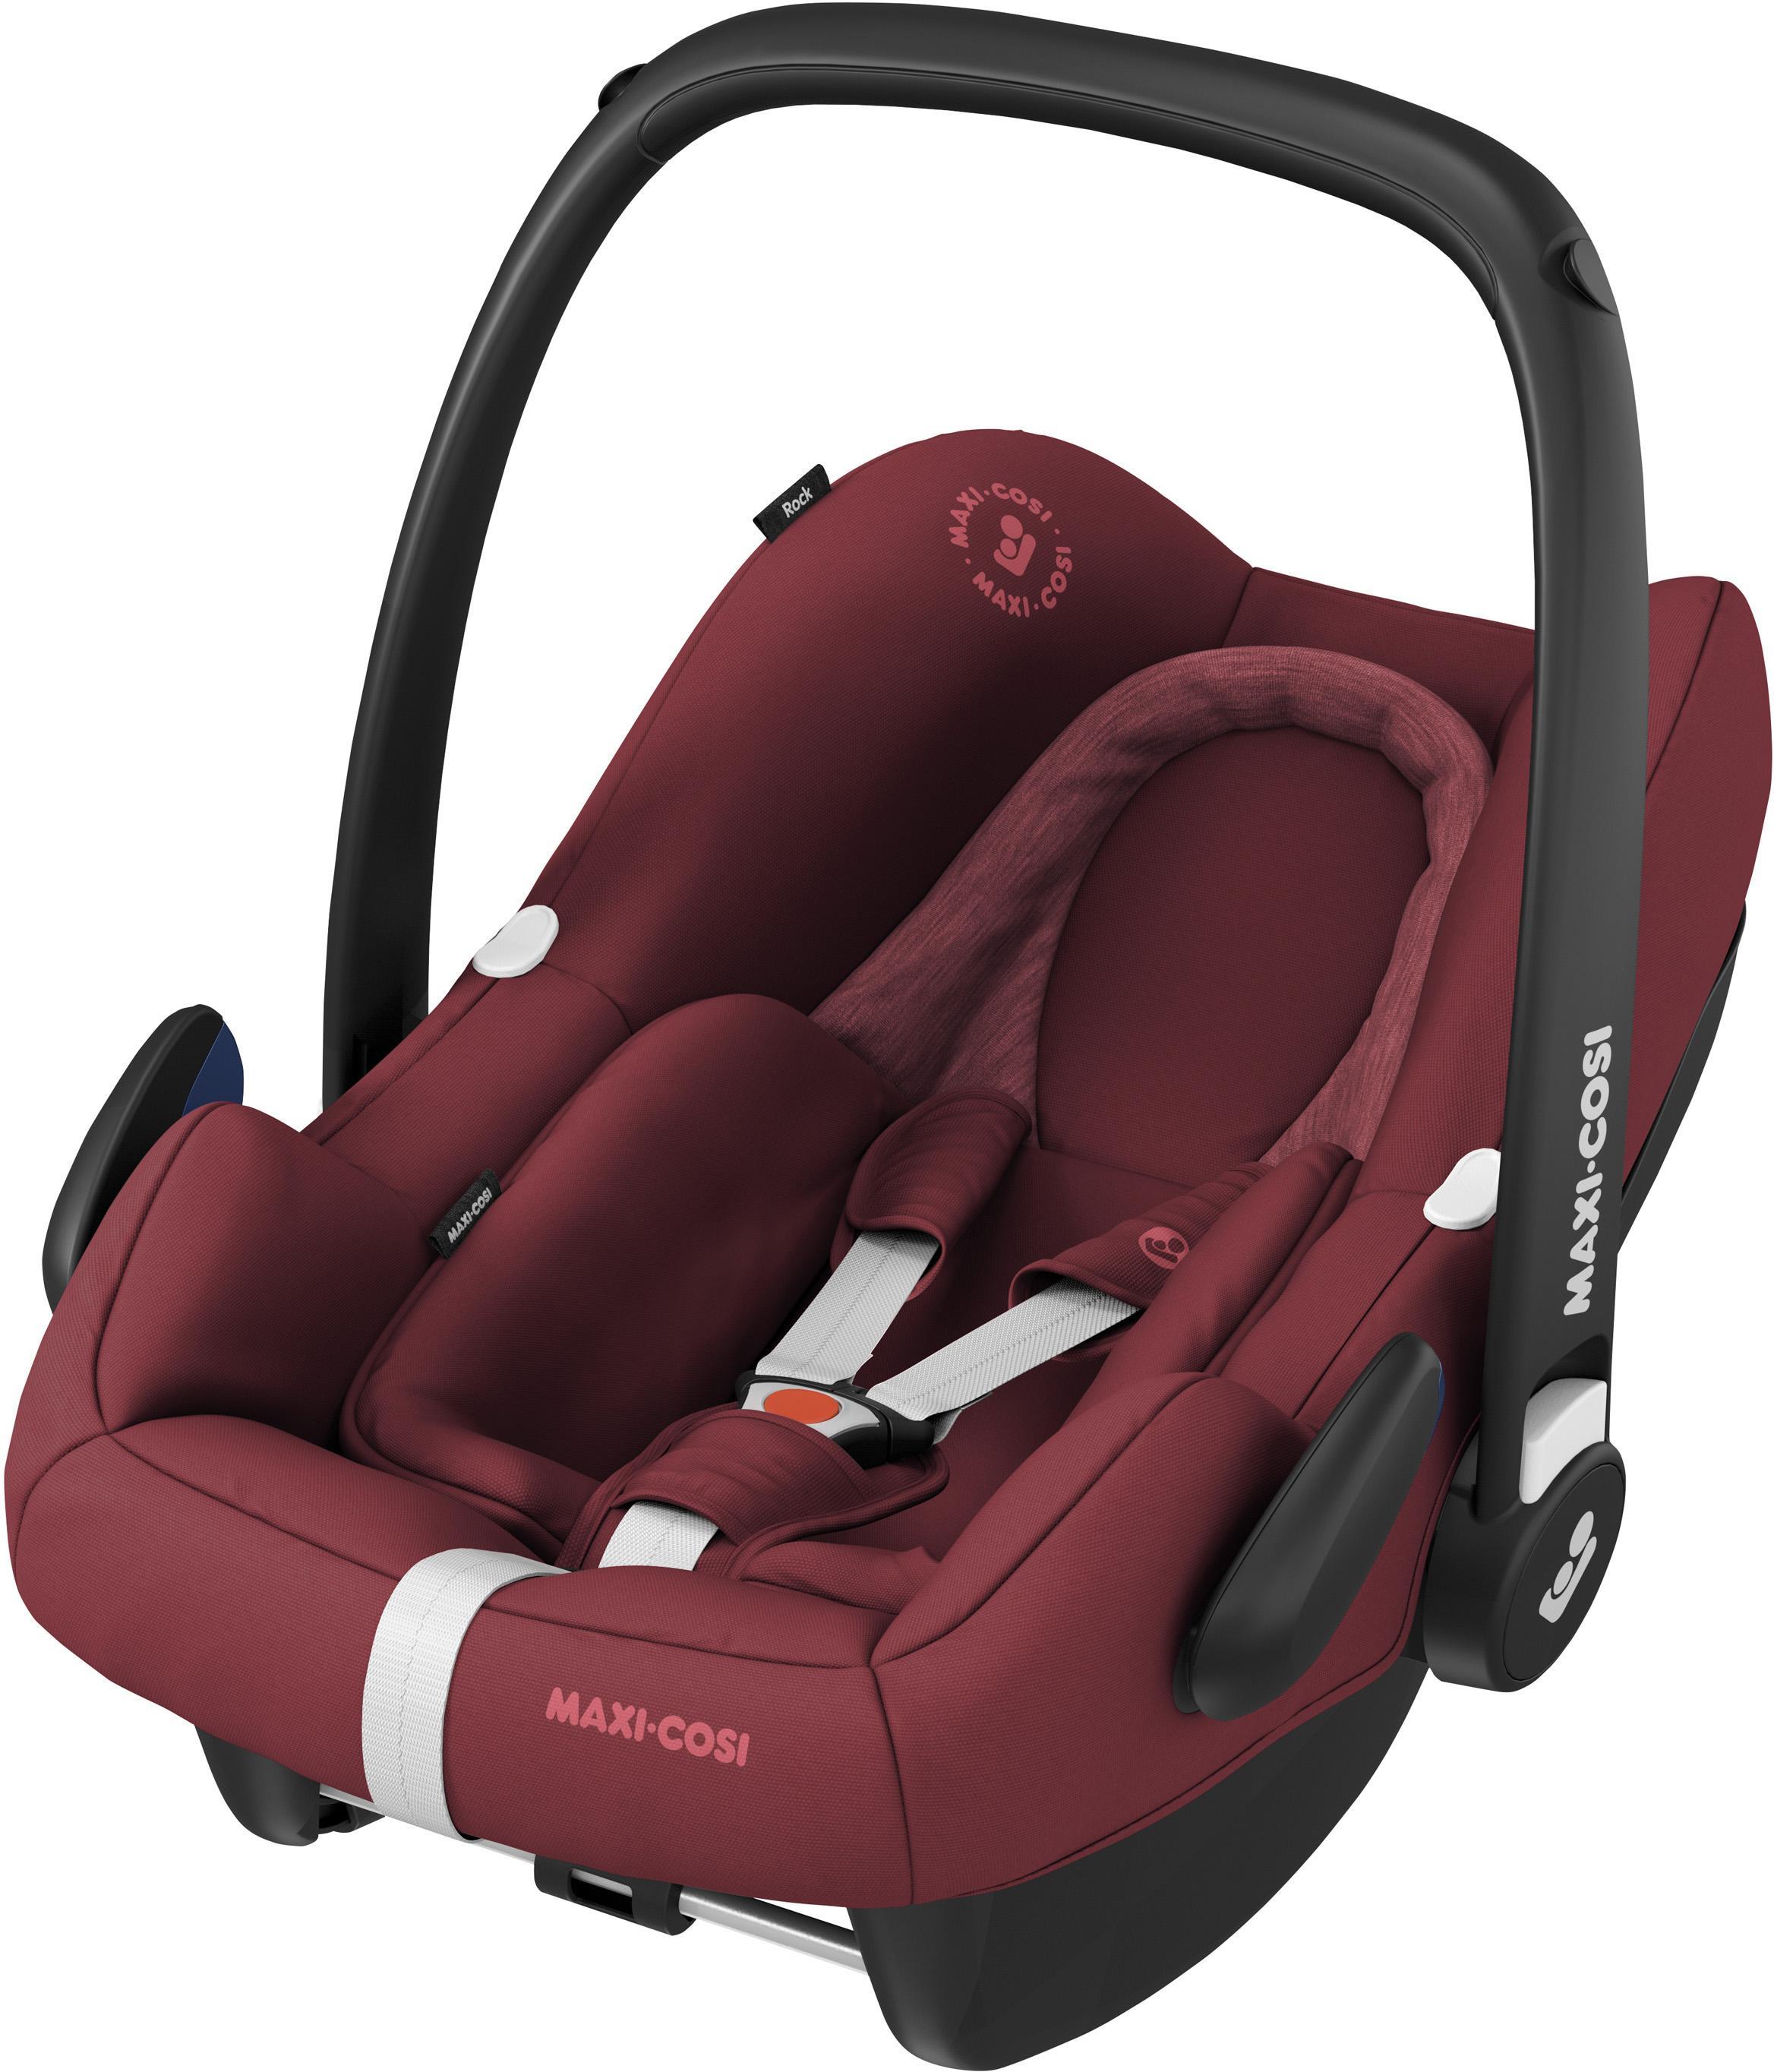 Maxi Cosi Rock i-Size Car Seat